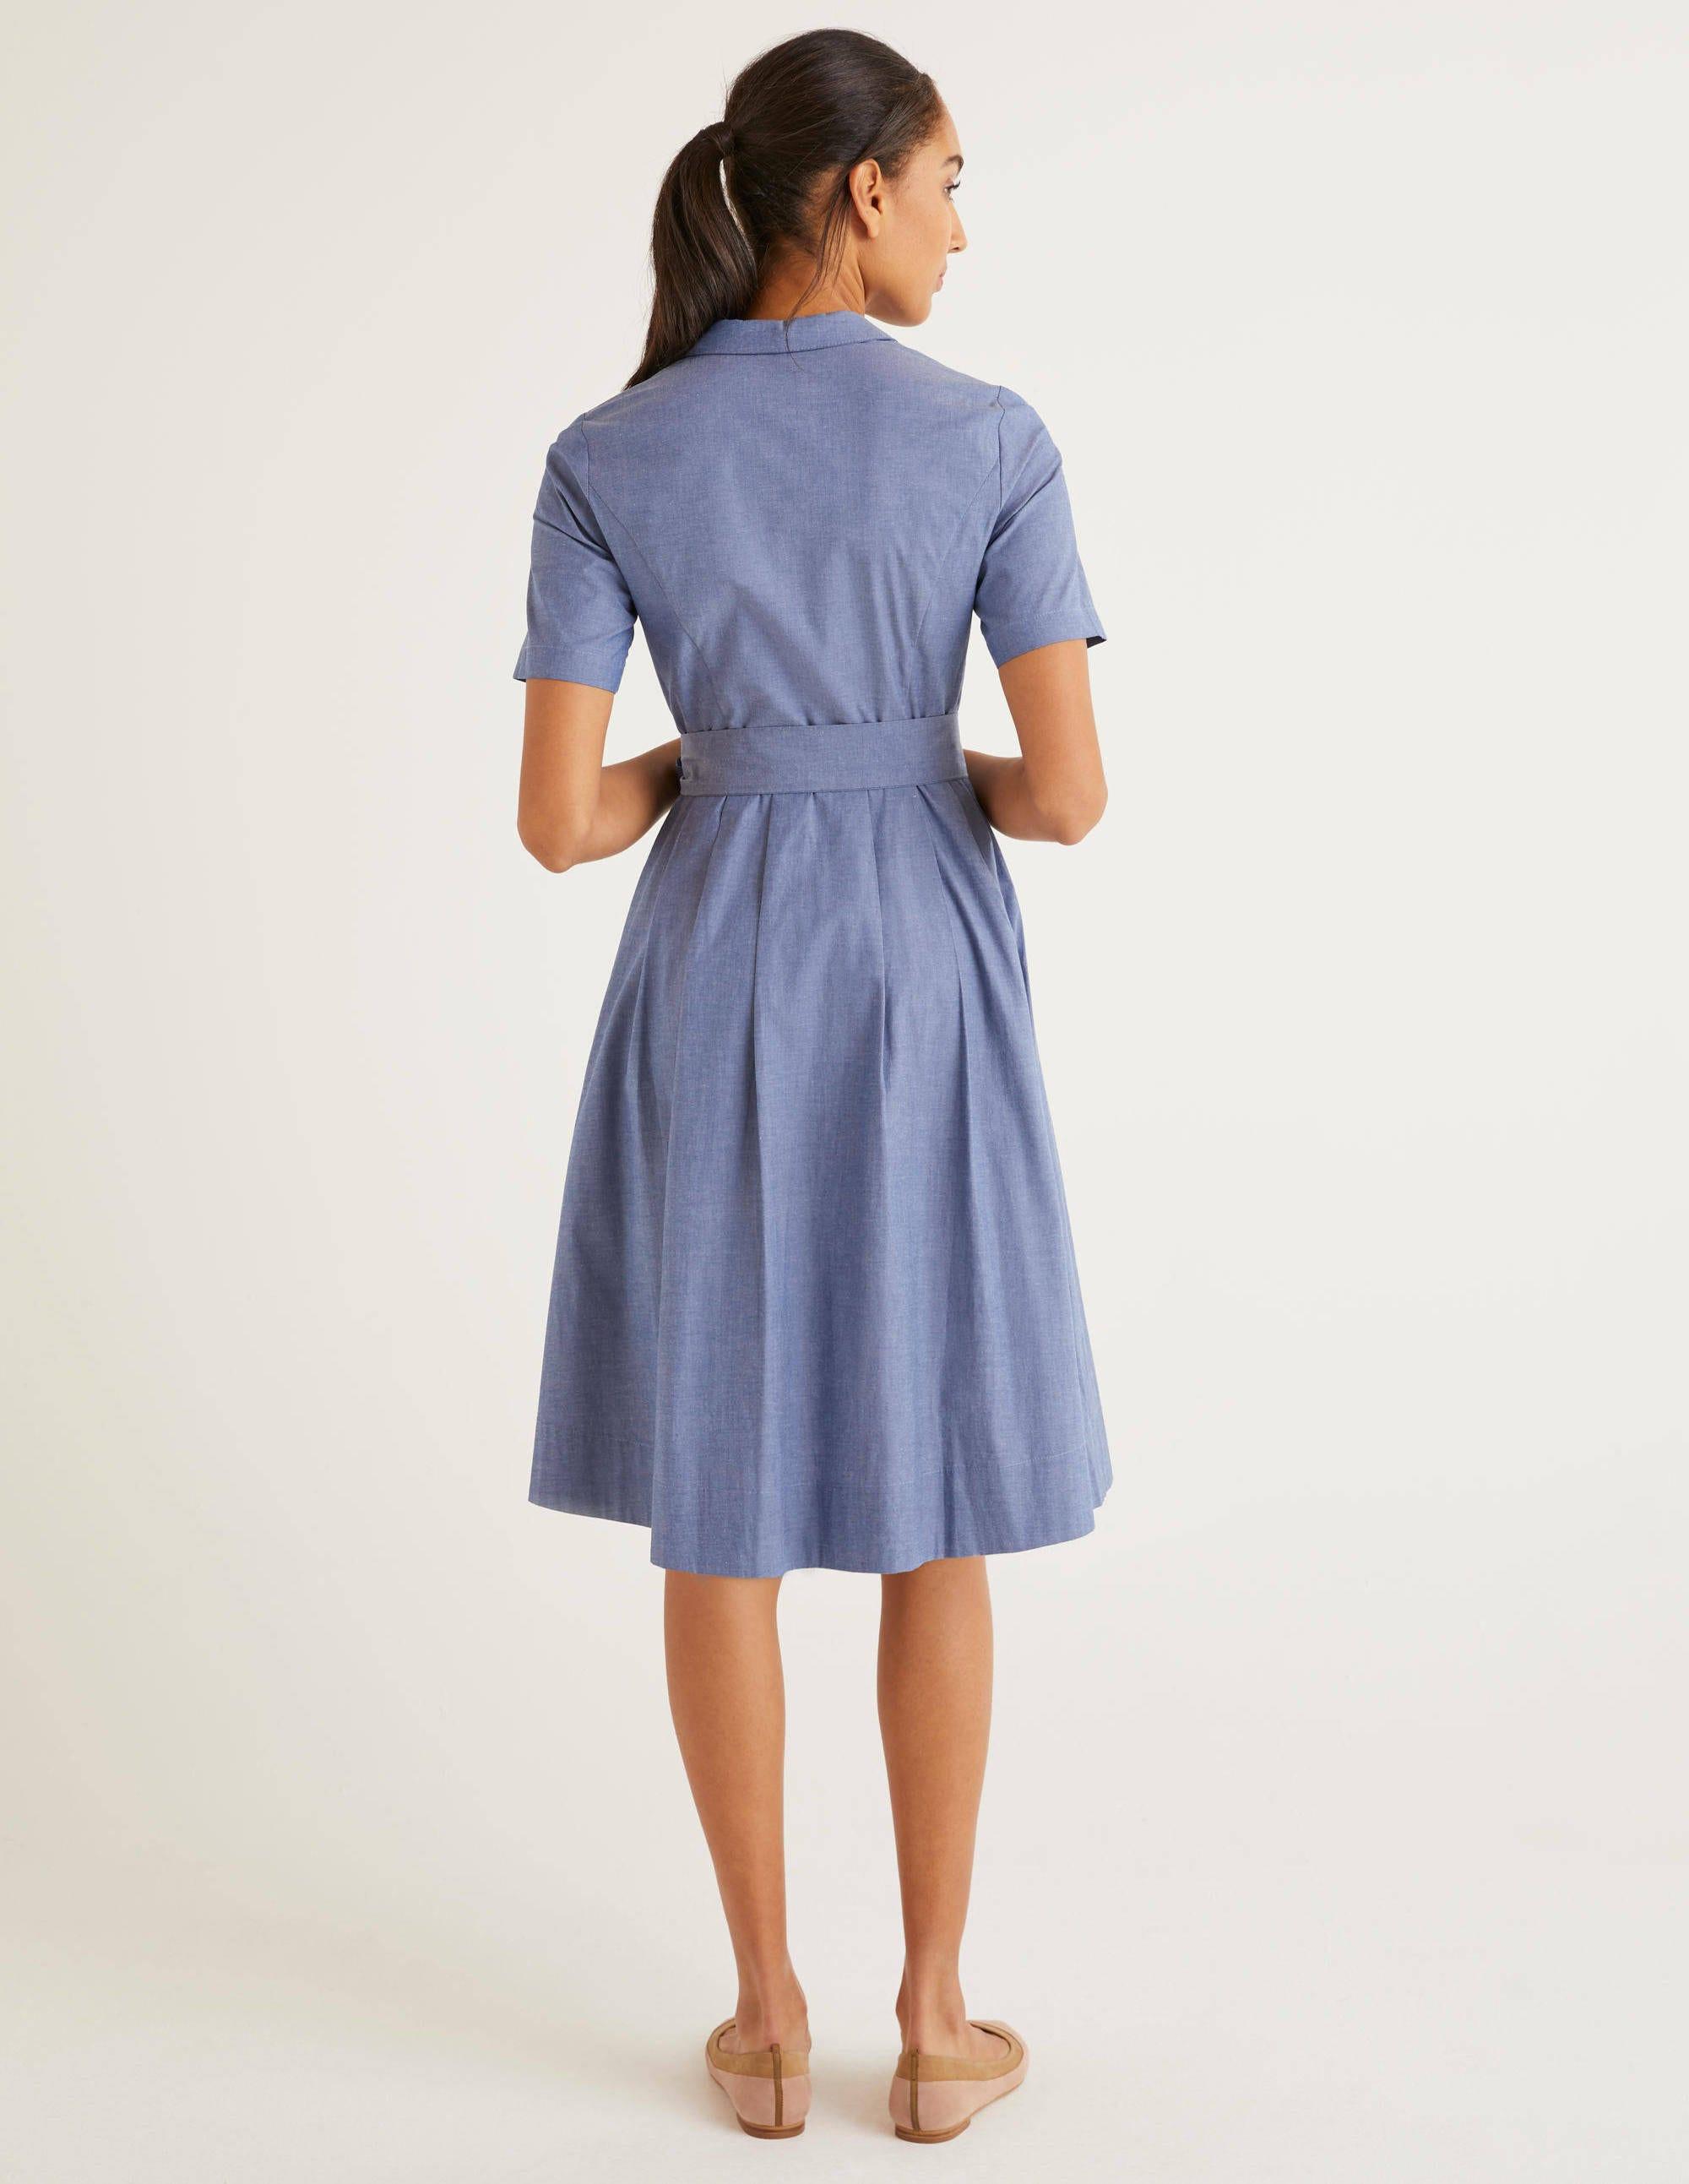 Anastasia Shirt Dress Light Chambray